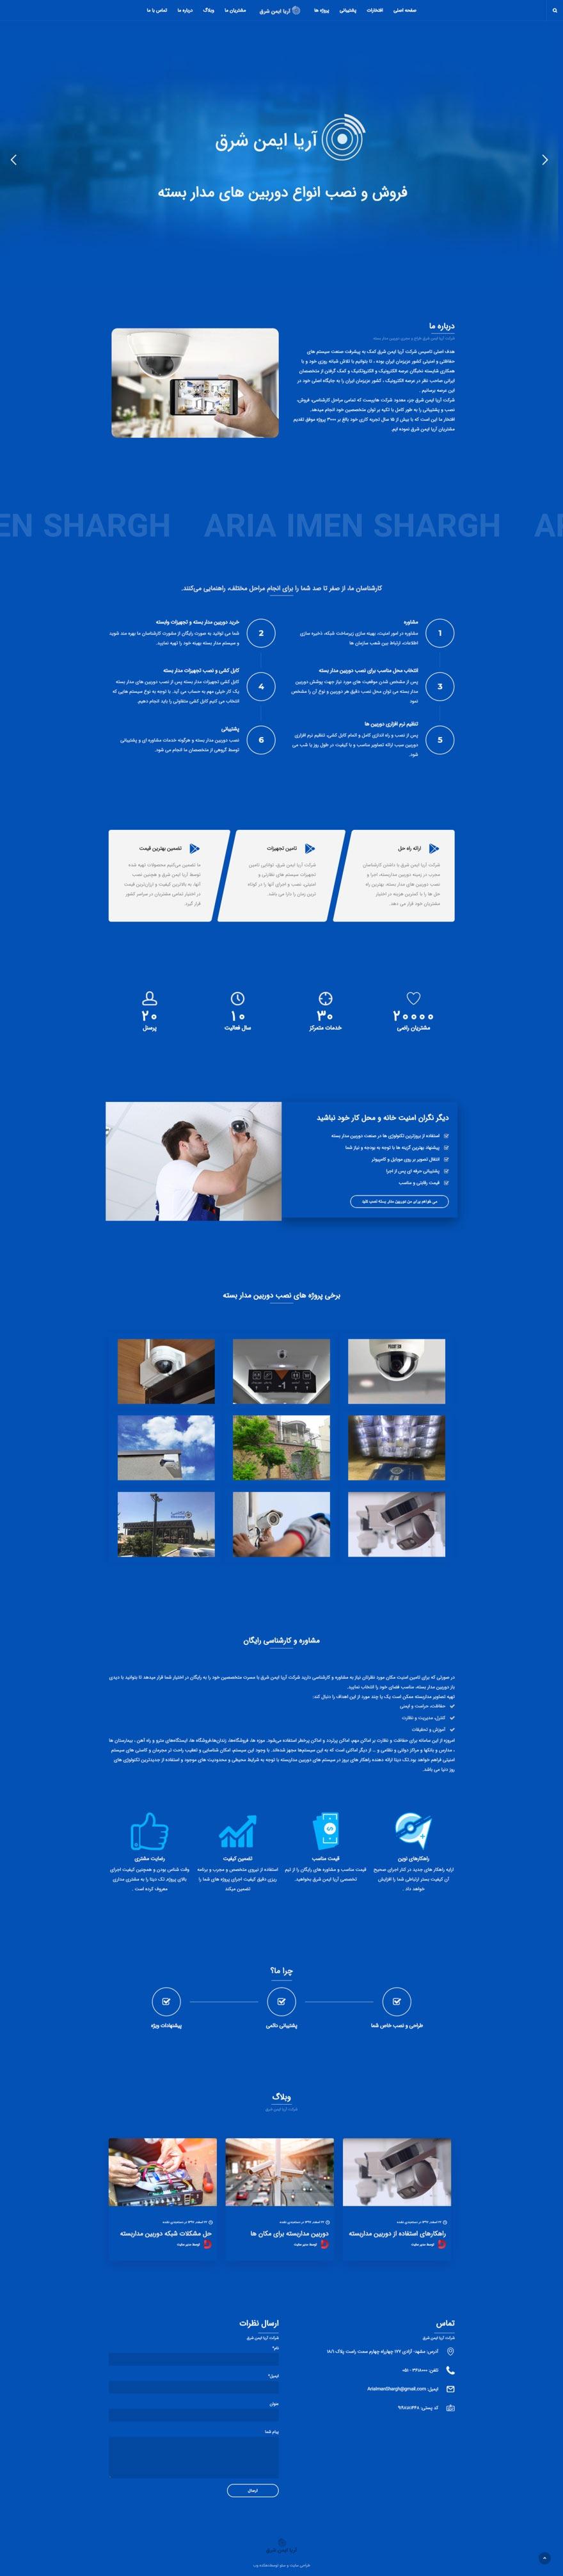 طراحی سایت شرکت آریا ایمن شرق